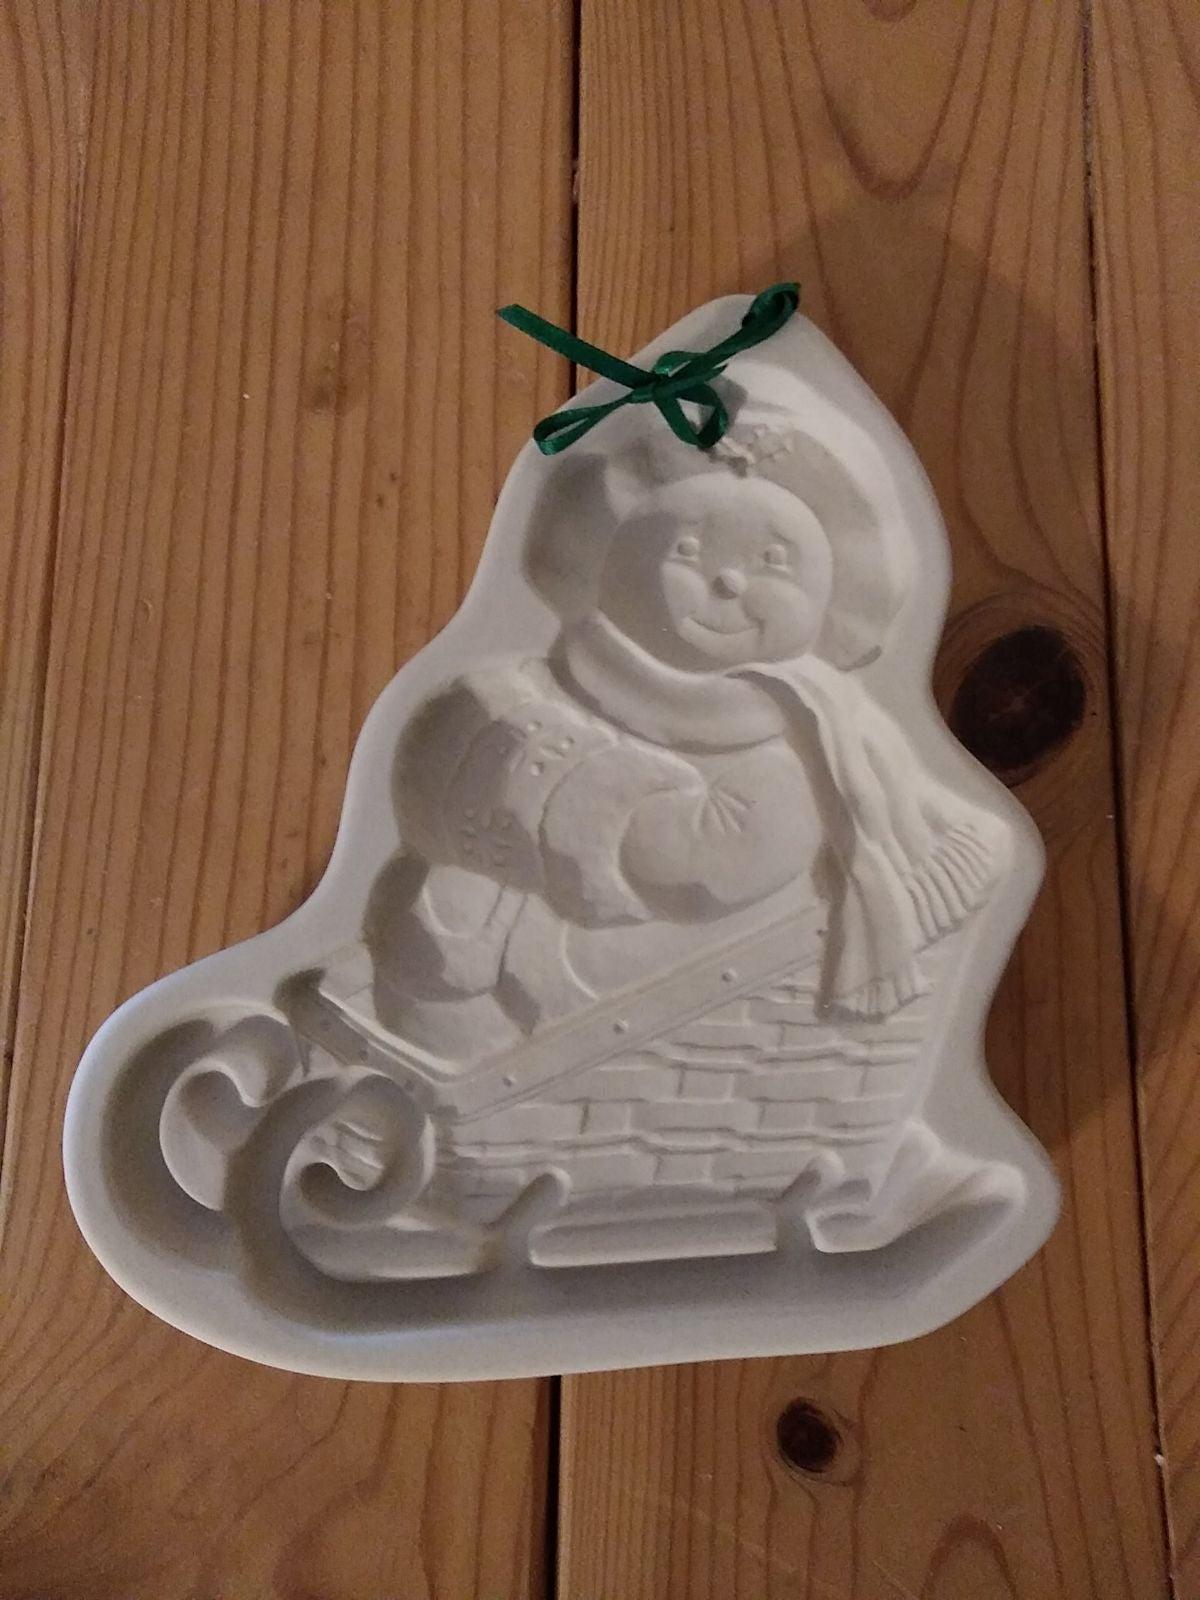 "1998 Longaberger Pottery 6"" Snowman mold"